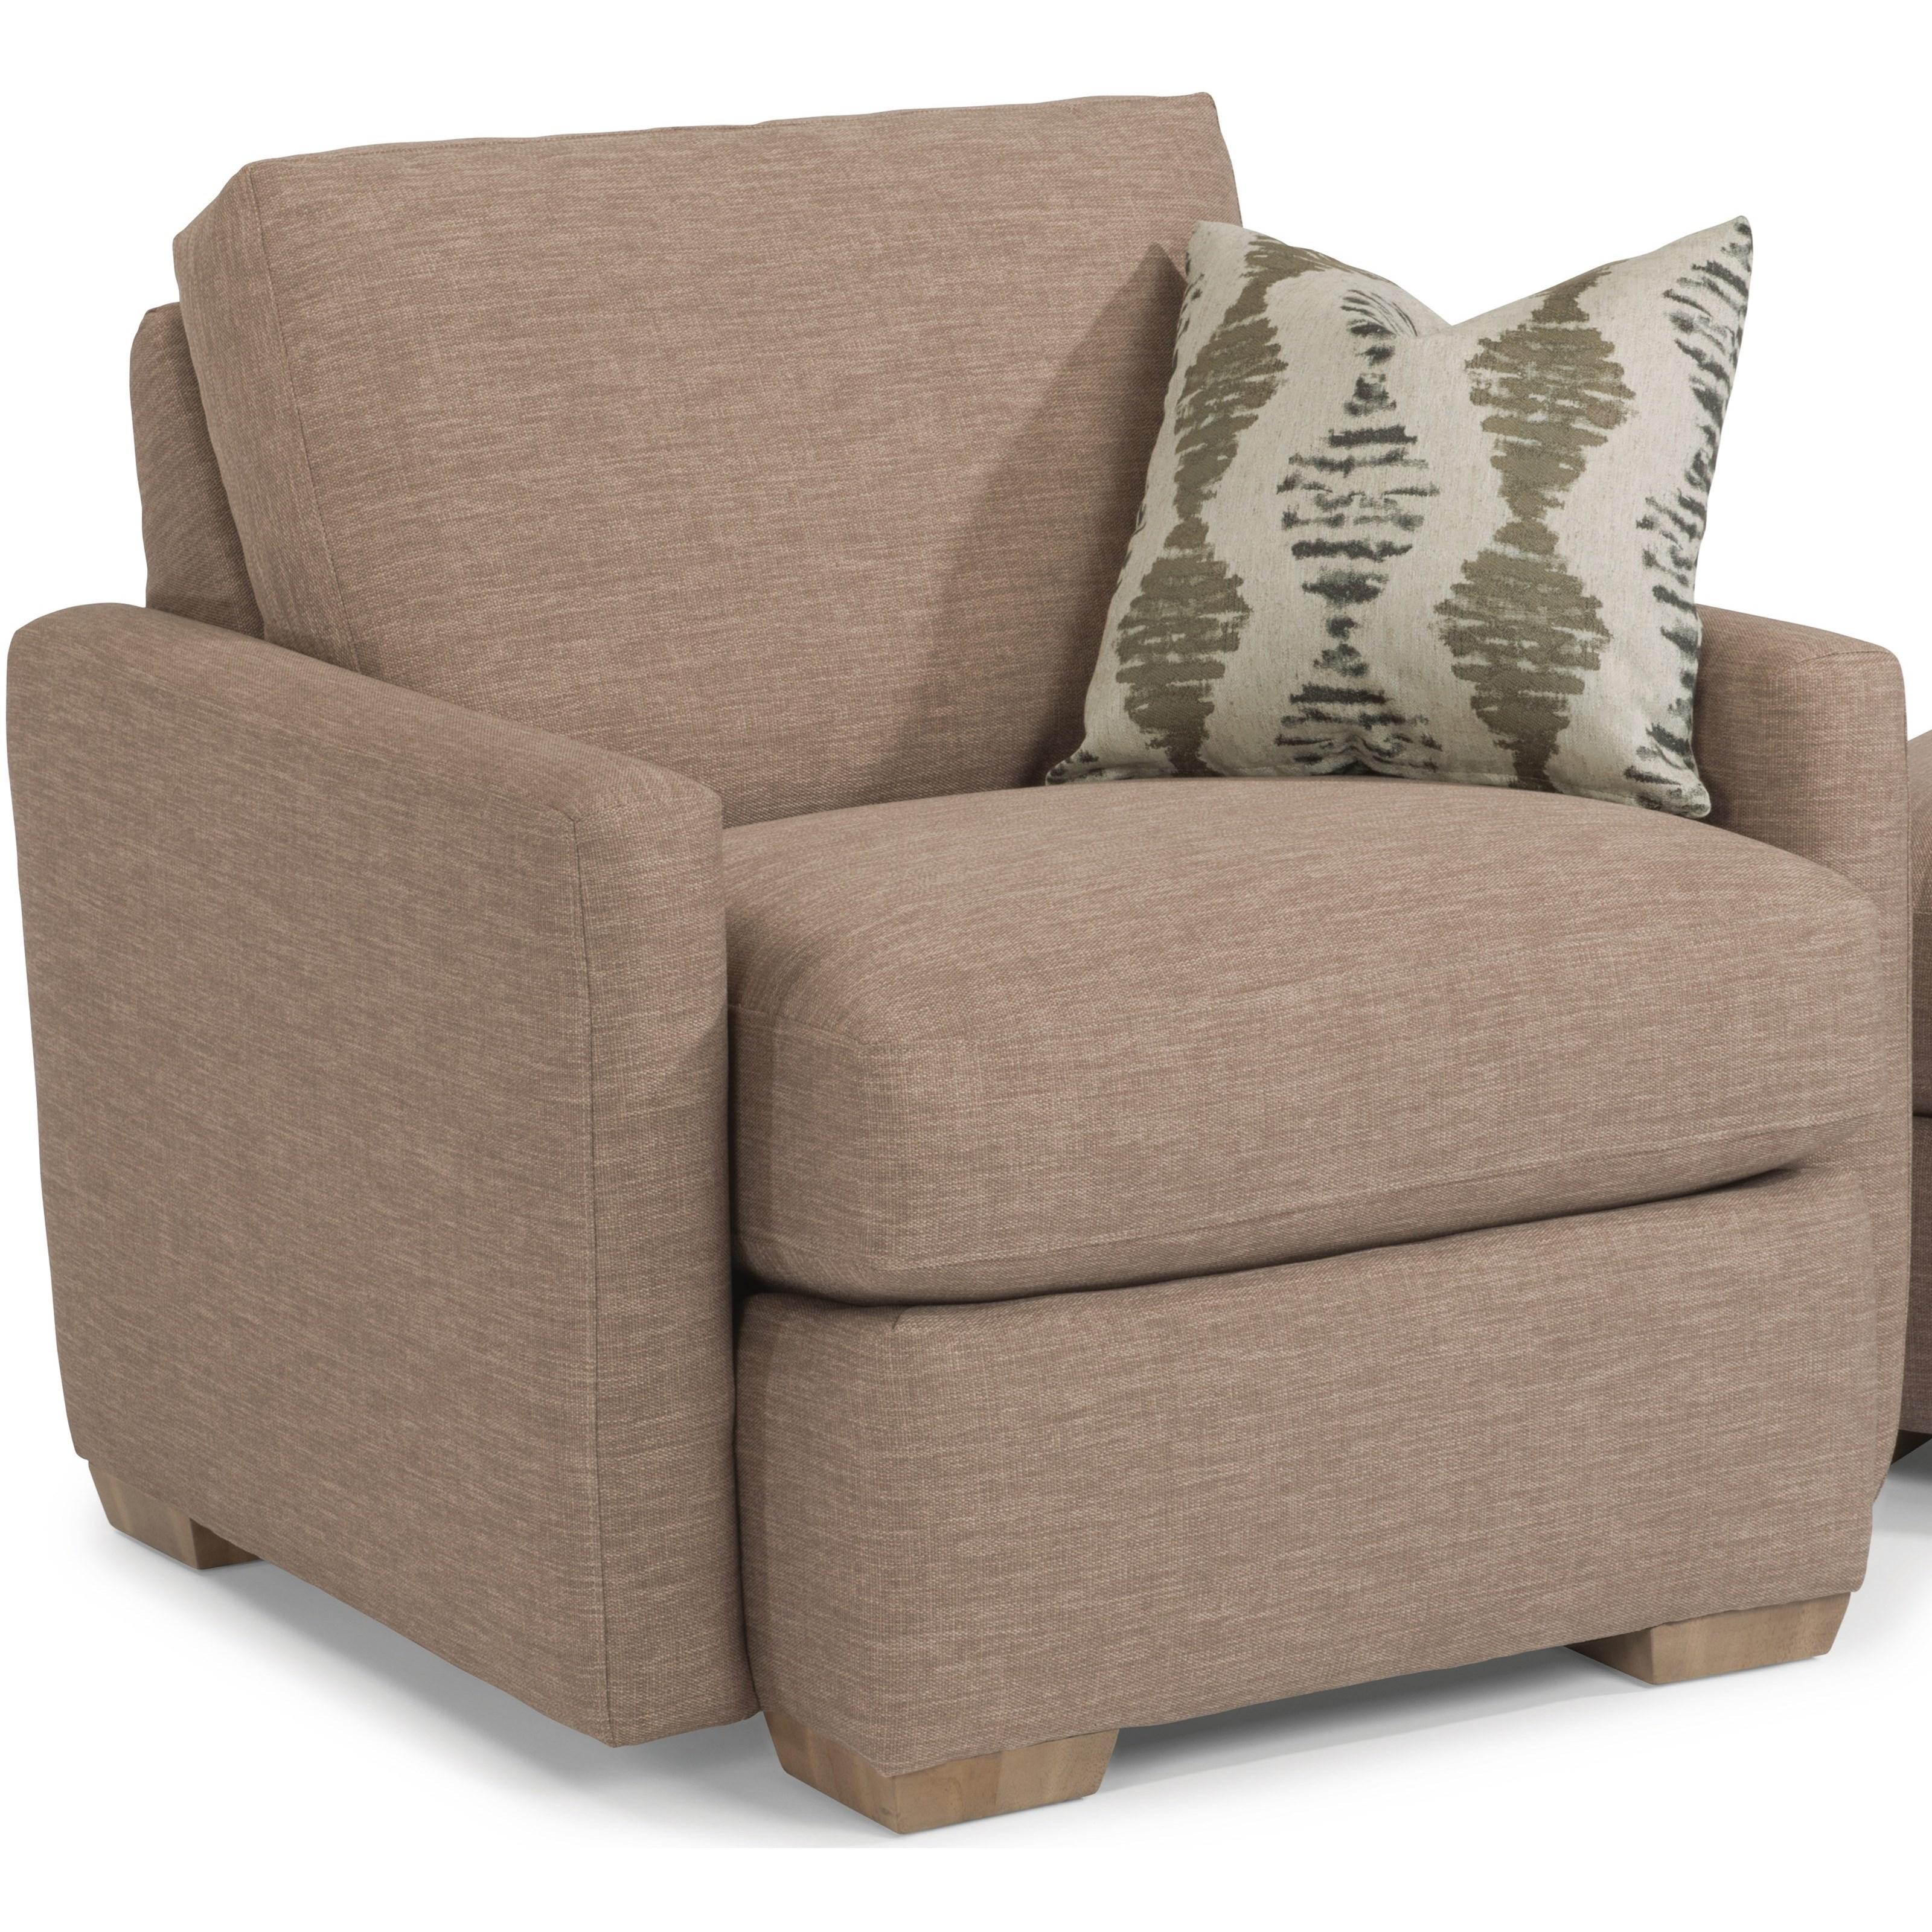 Flexsteel Michelle Chair  - Item Number: 7906-10